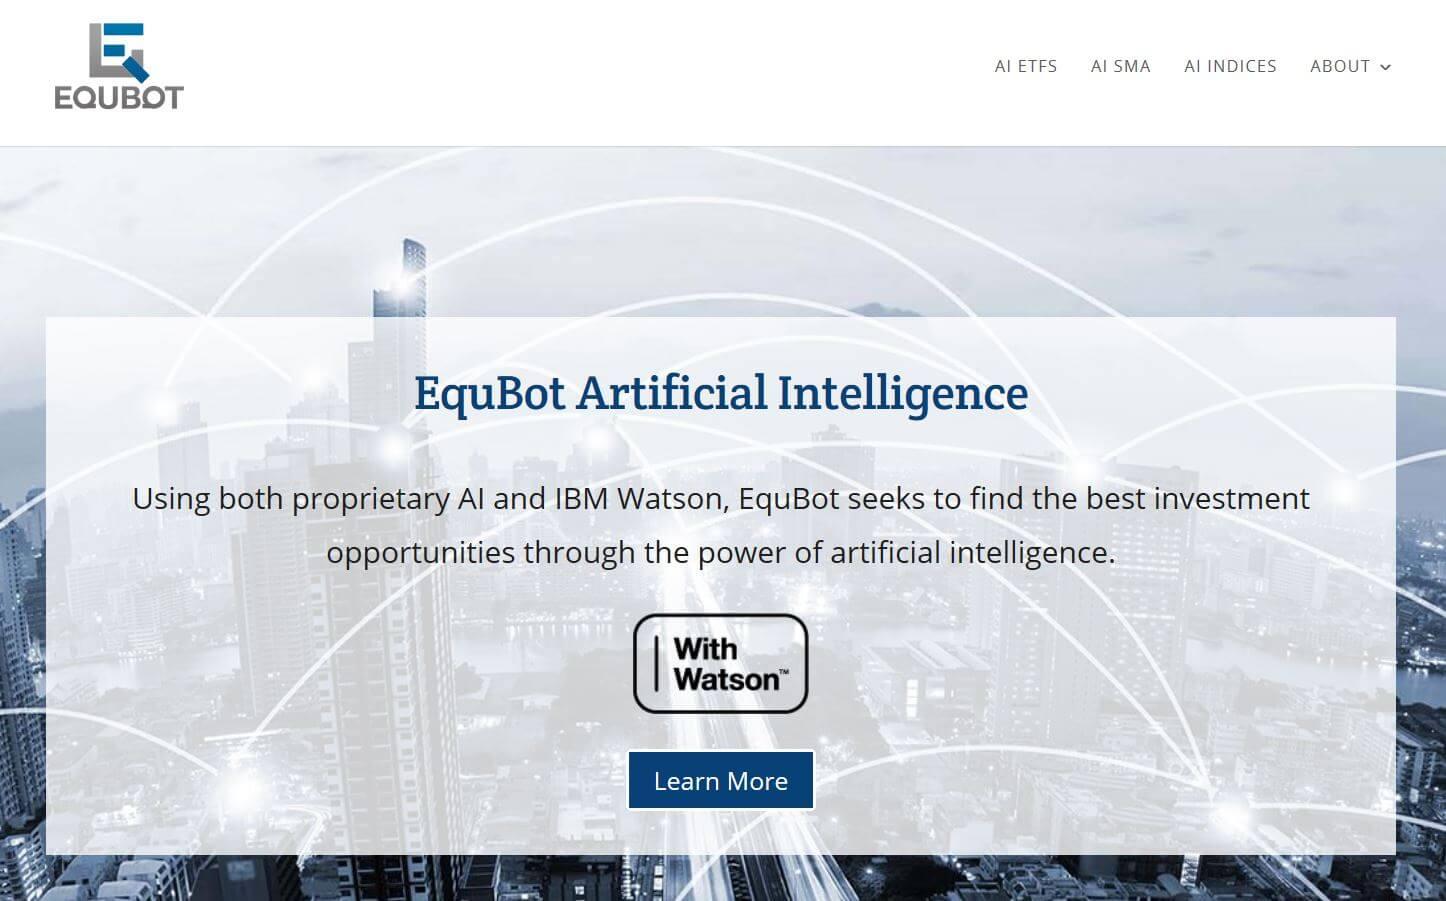 EquBot.com